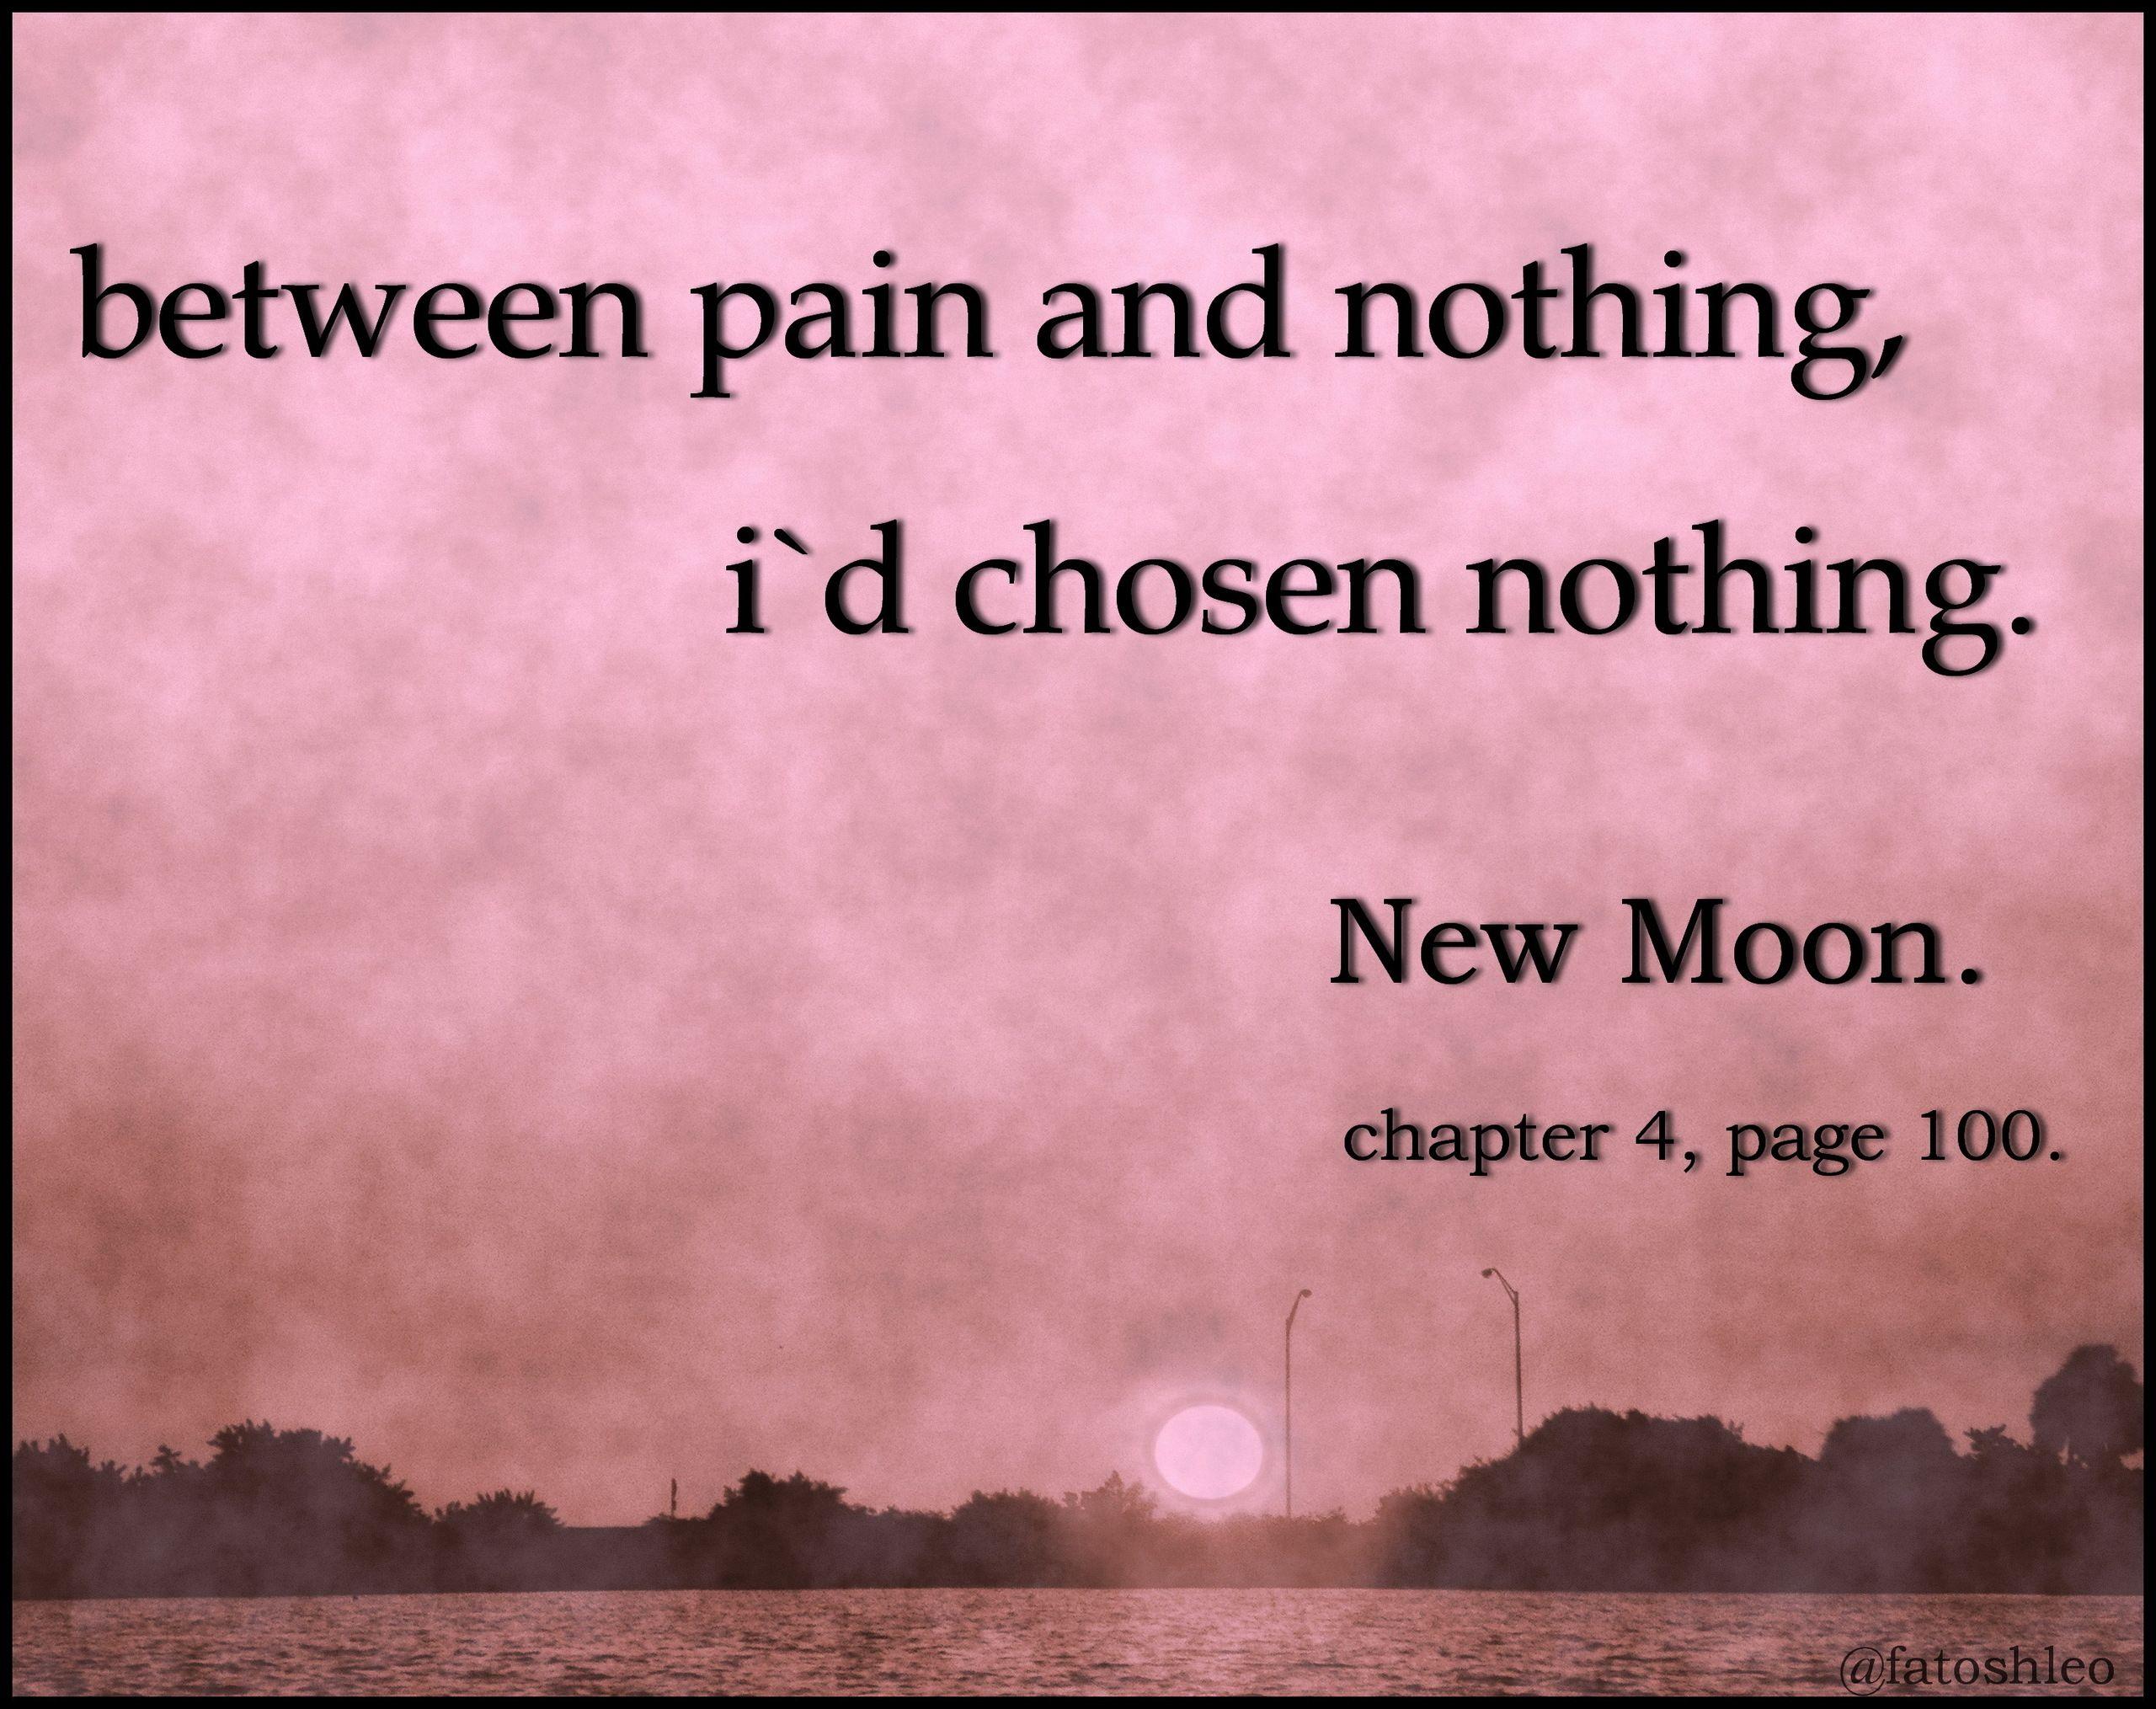 bella new moon quote - books-to-read Fan Art